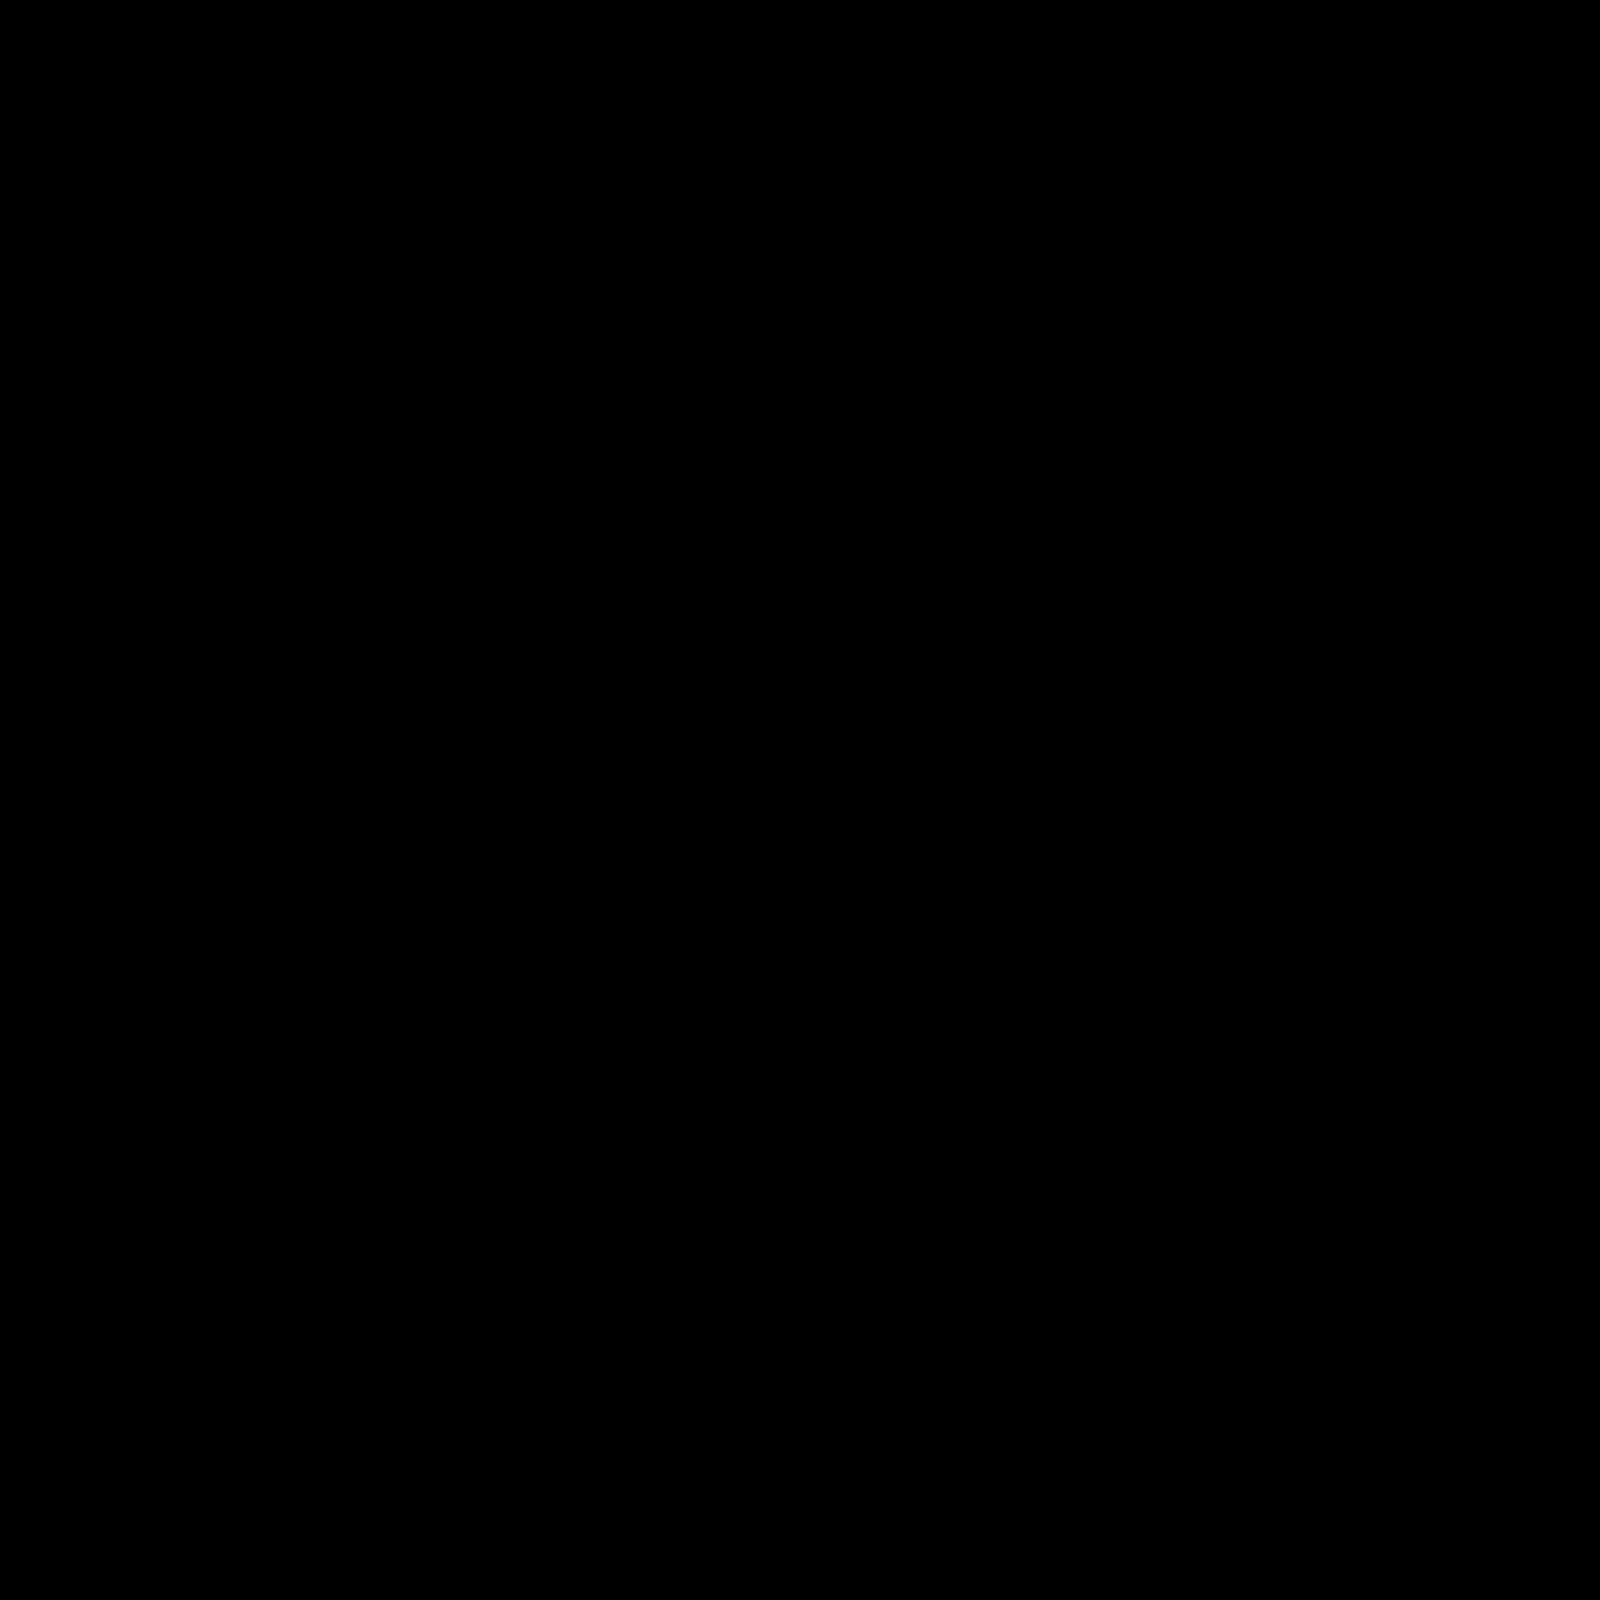 5 Serce icon